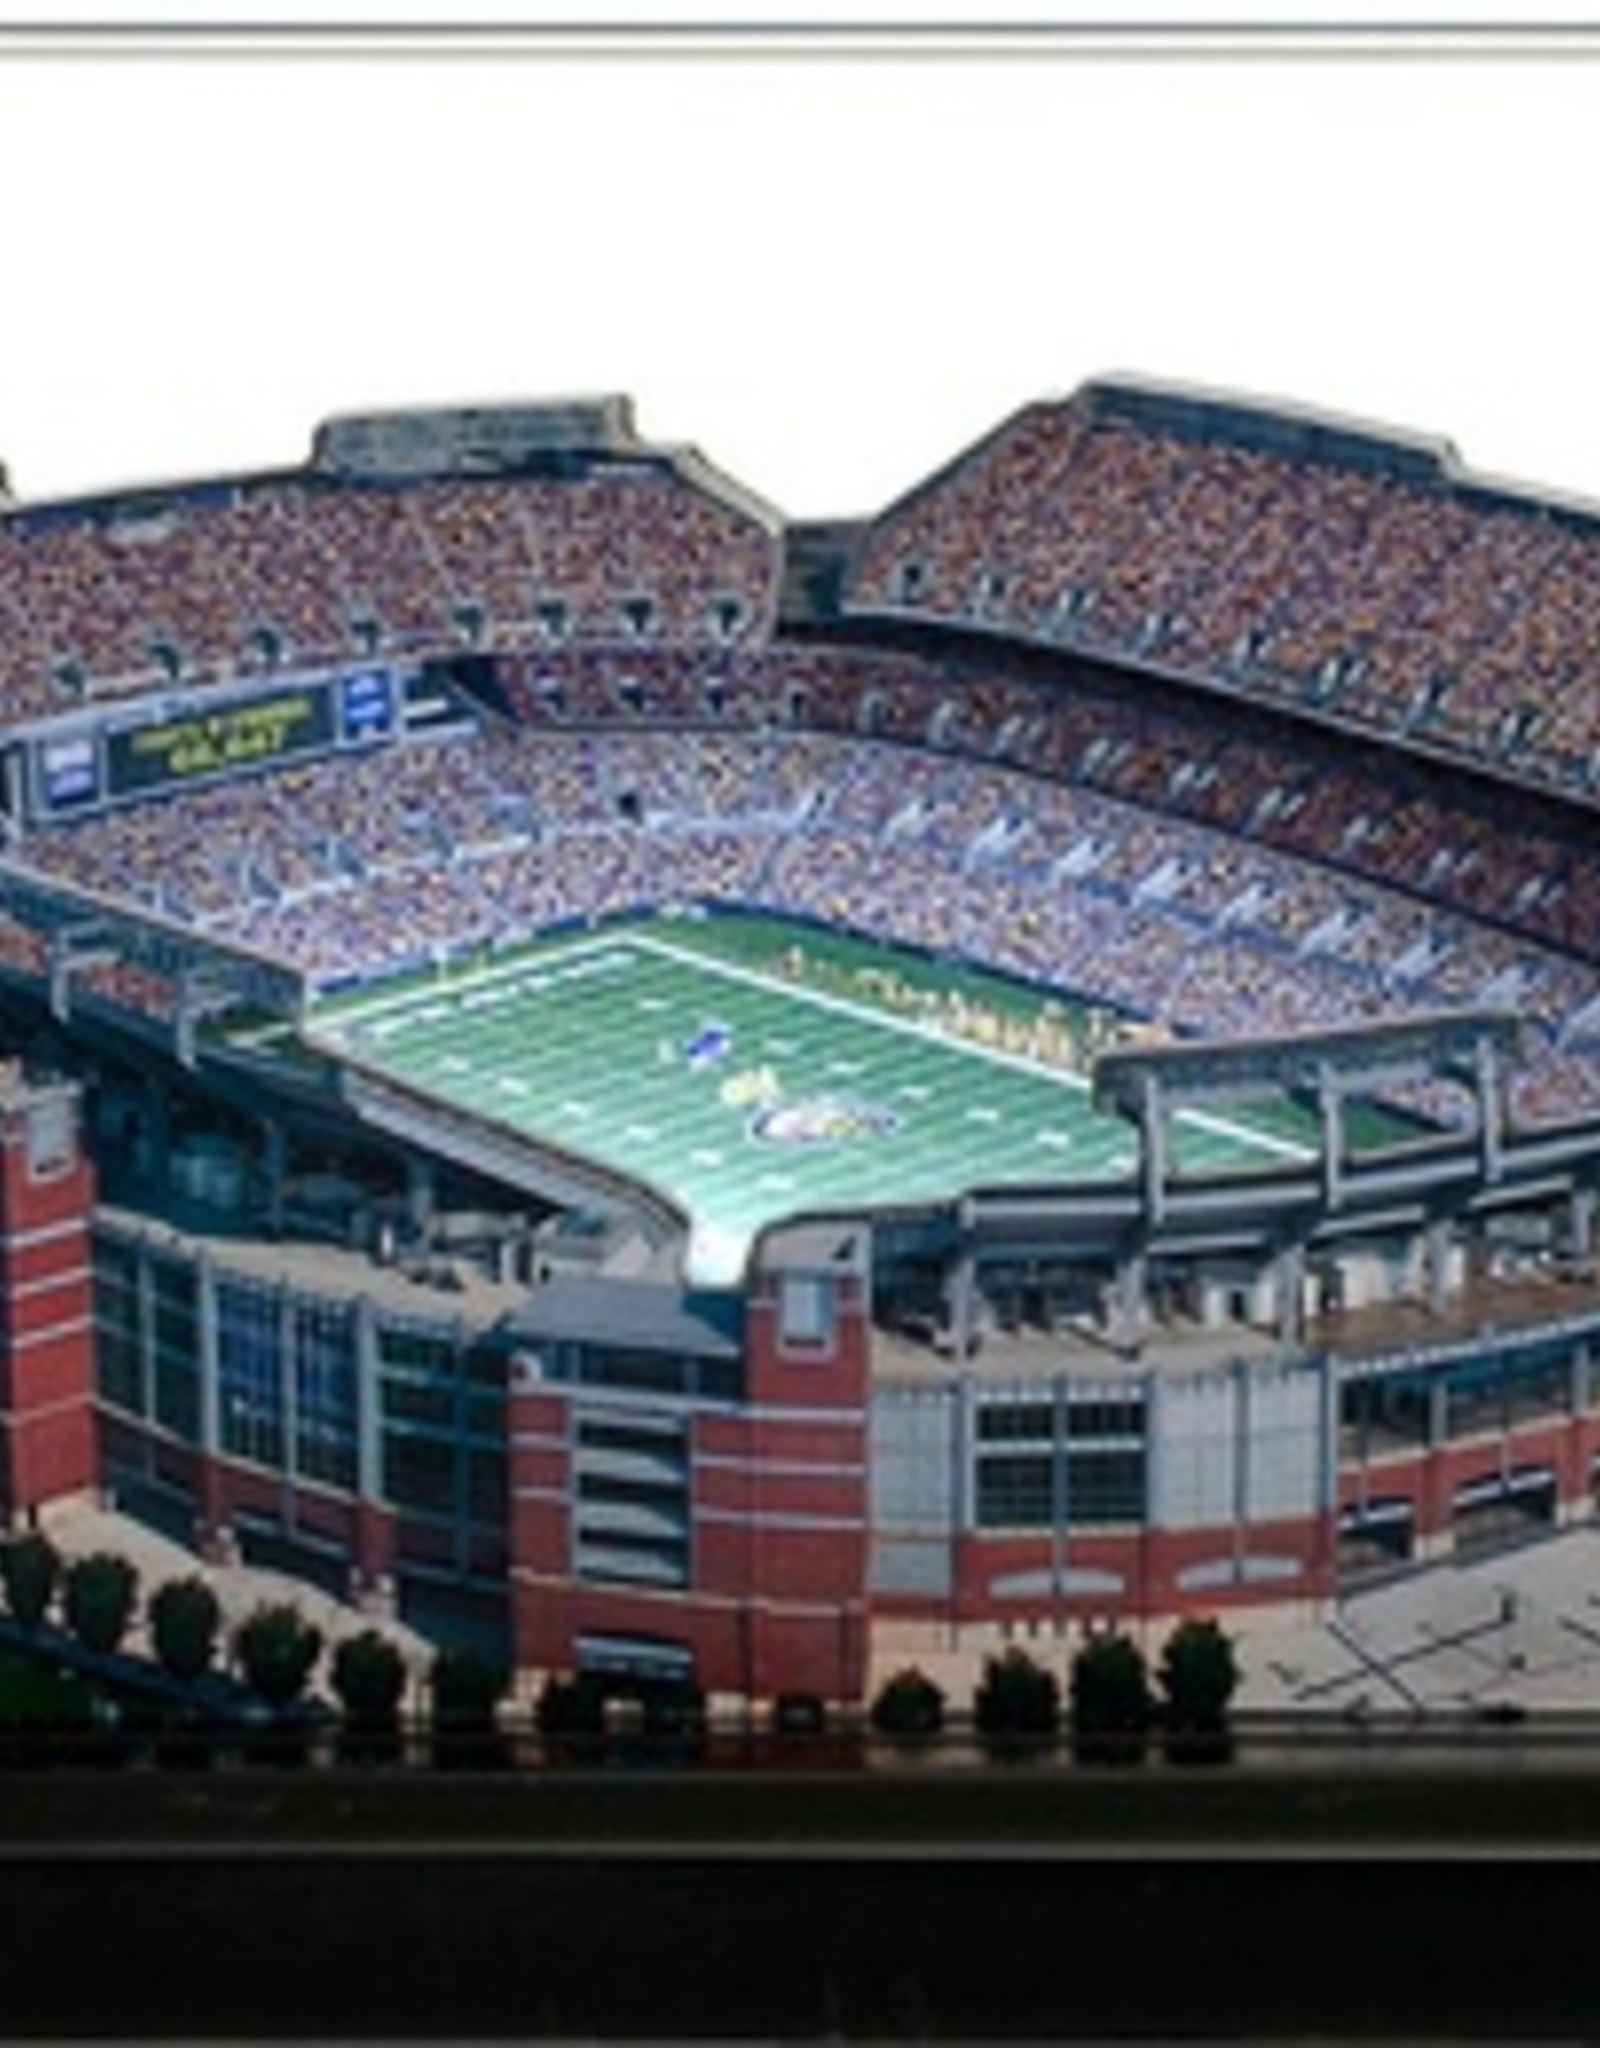 HOMEFIELDS Baltimore Ravens 13IN Lighted Replica M&T Bank Stadium